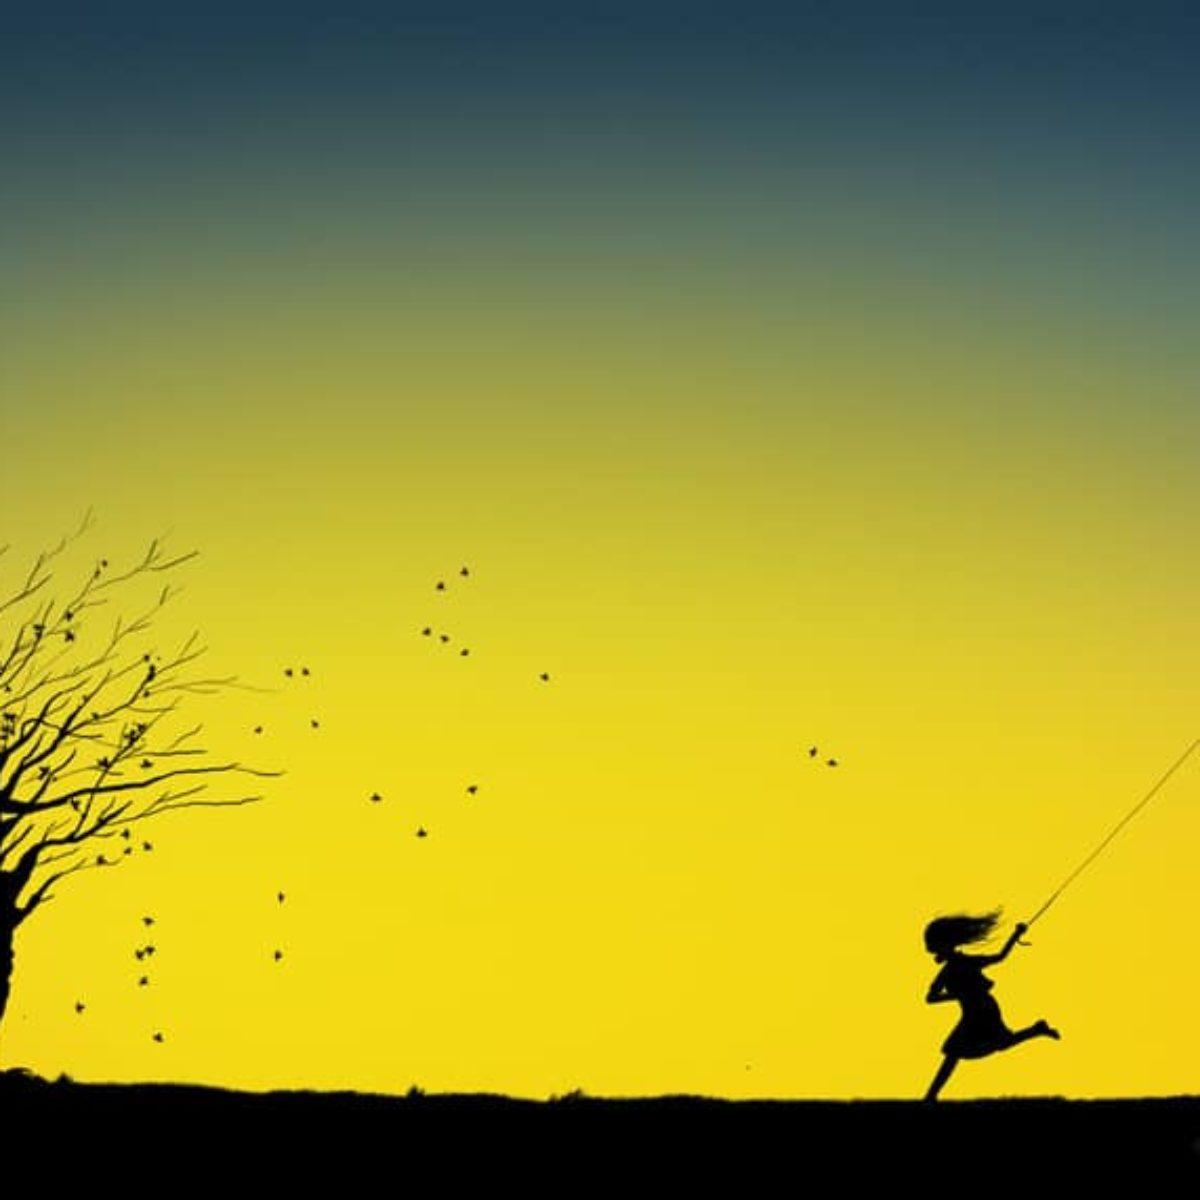 Minimalismus lernen minimalismus lebensstil coaching for Minimalismus lebensstil